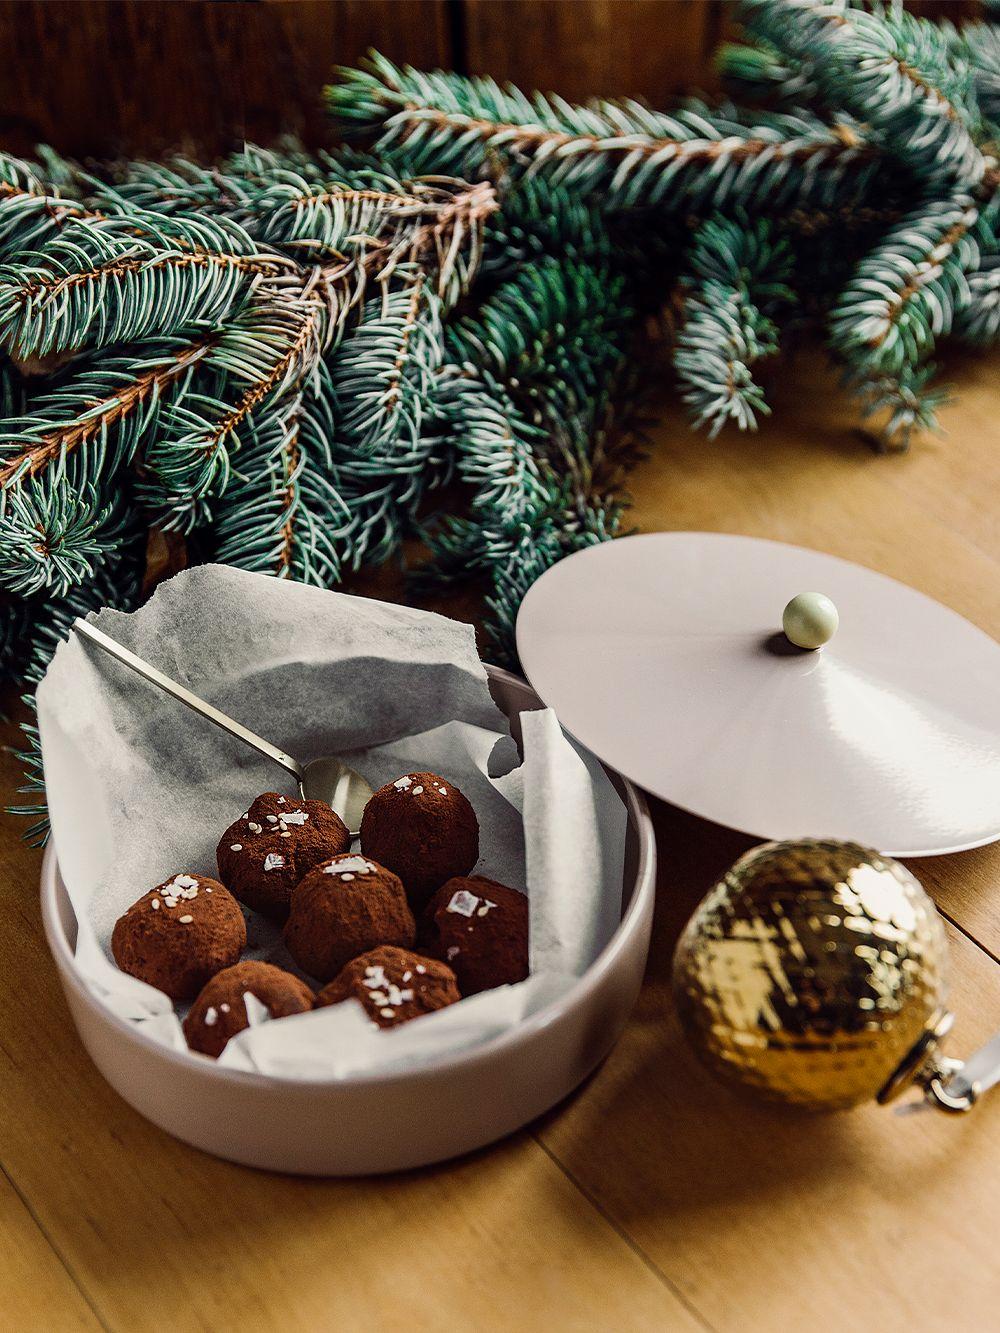 Sesame truffles in Tivoli's Marquee box